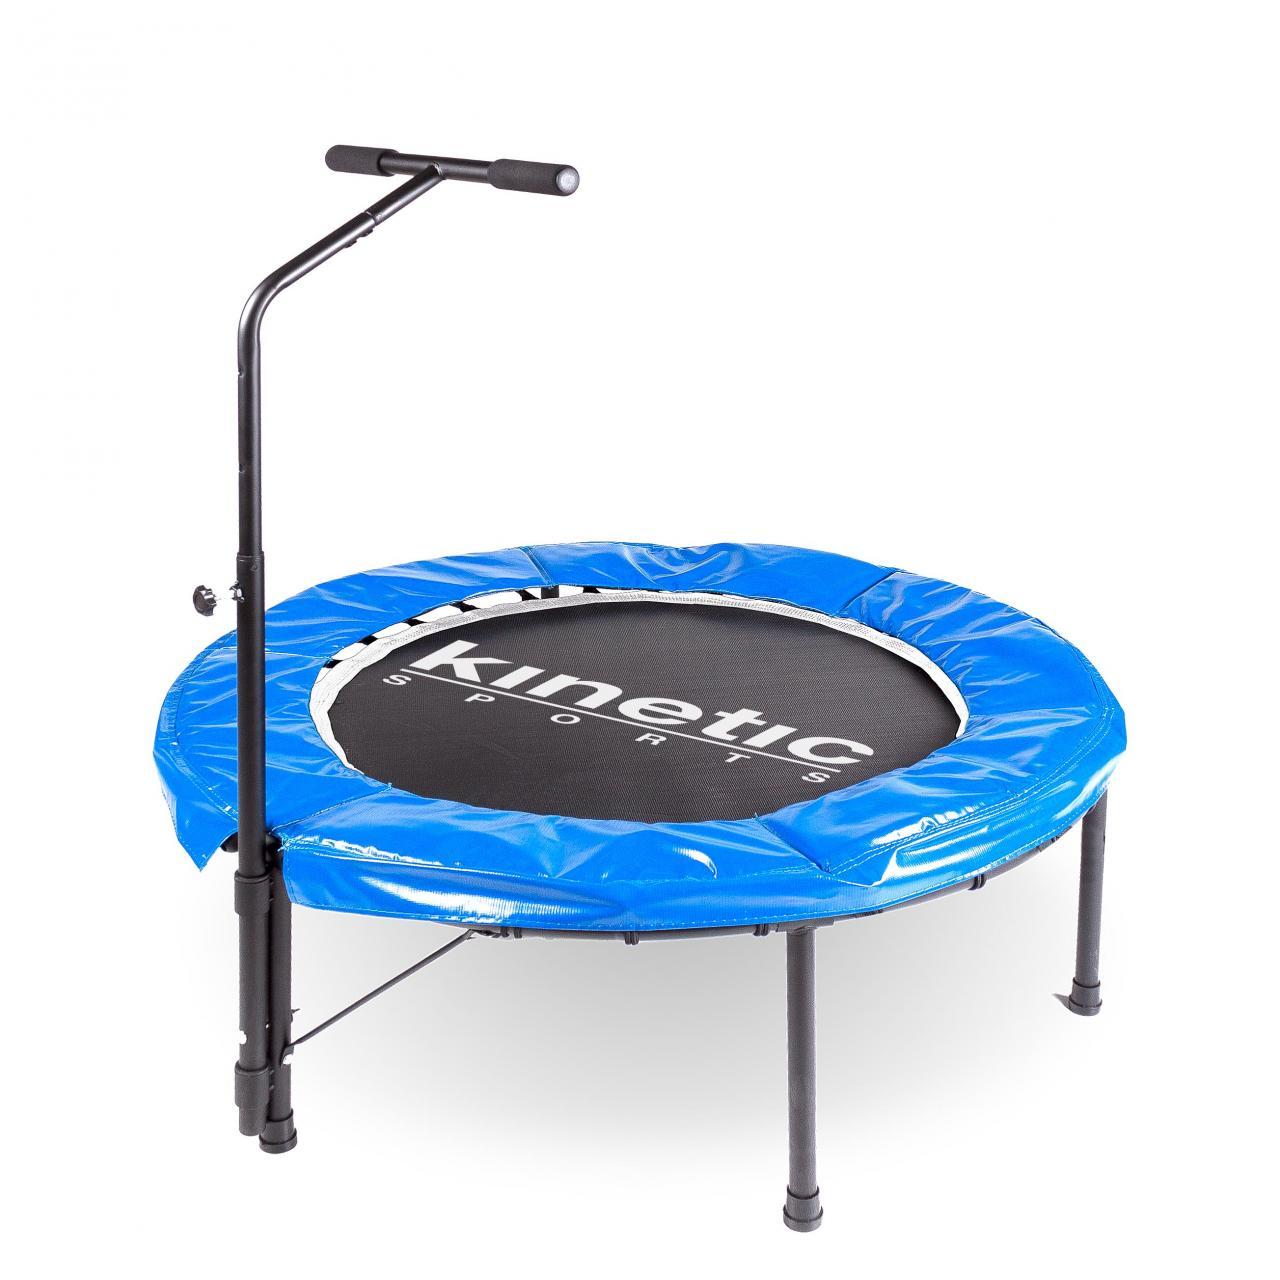 fitness trampolin sport fitnesstrampoli gummiseil federung randabdeckung ebay. Black Bedroom Furniture Sets. Home Design Ideas